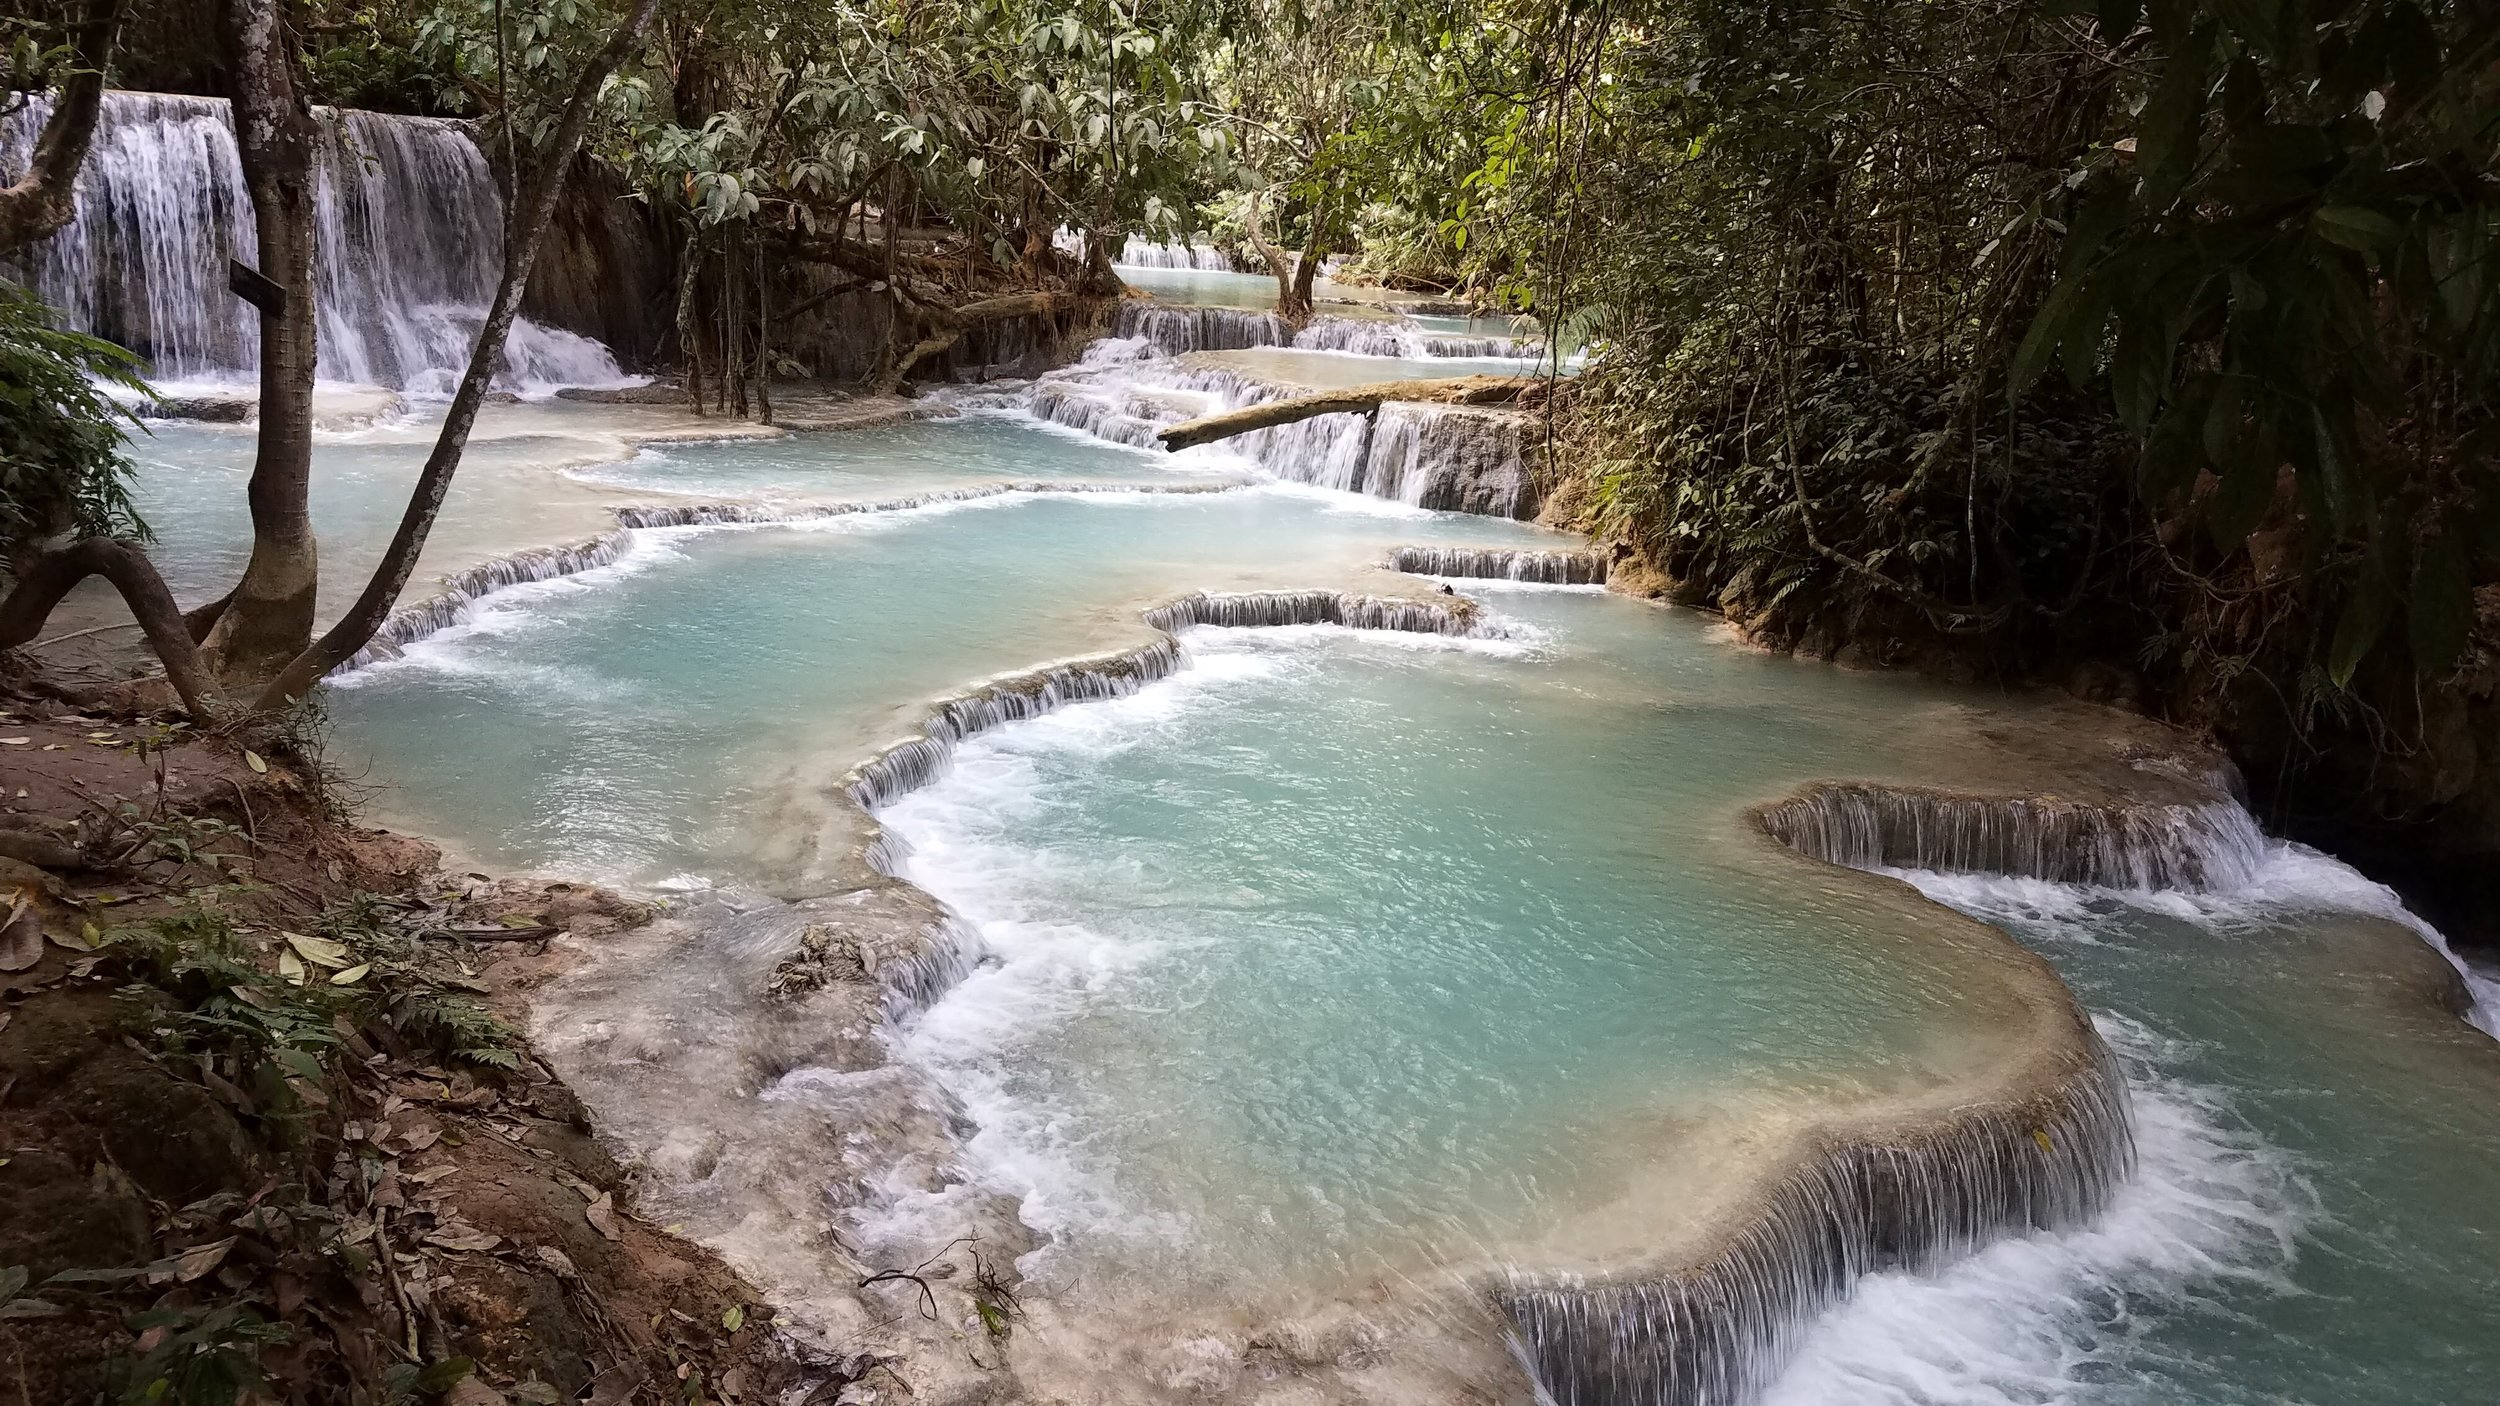 Enchanting pools